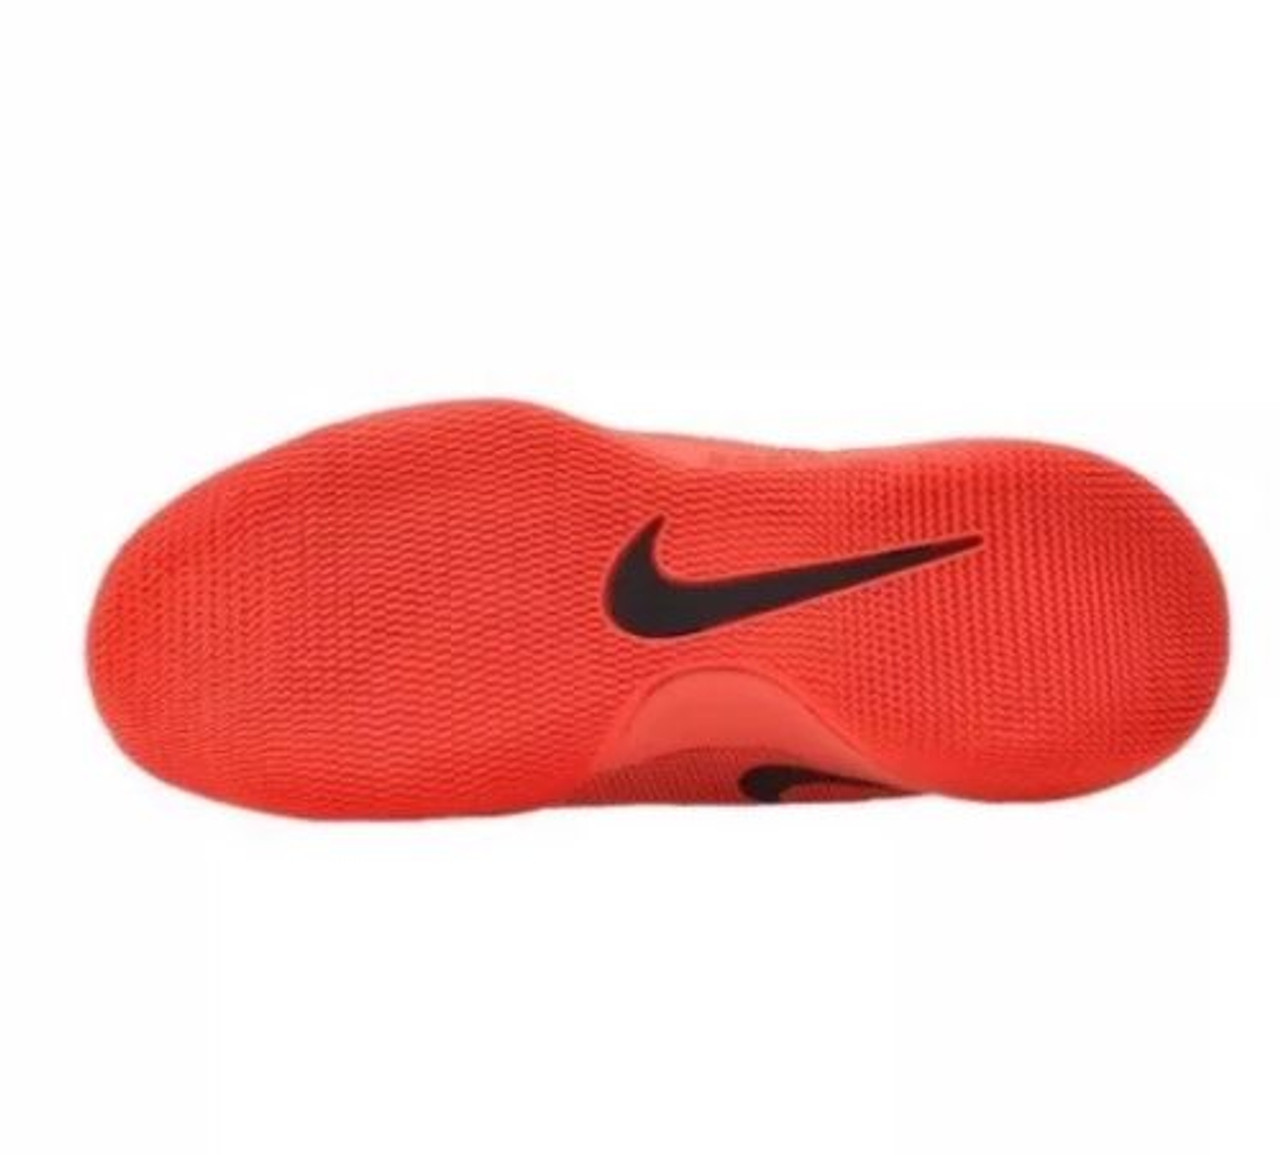 0567c2cc2a4d Men s Nike Hypershift Basketball 11.5 Shoes University Red  Men s Nike  Hypershift Basketball 11.5 Shoes University ...